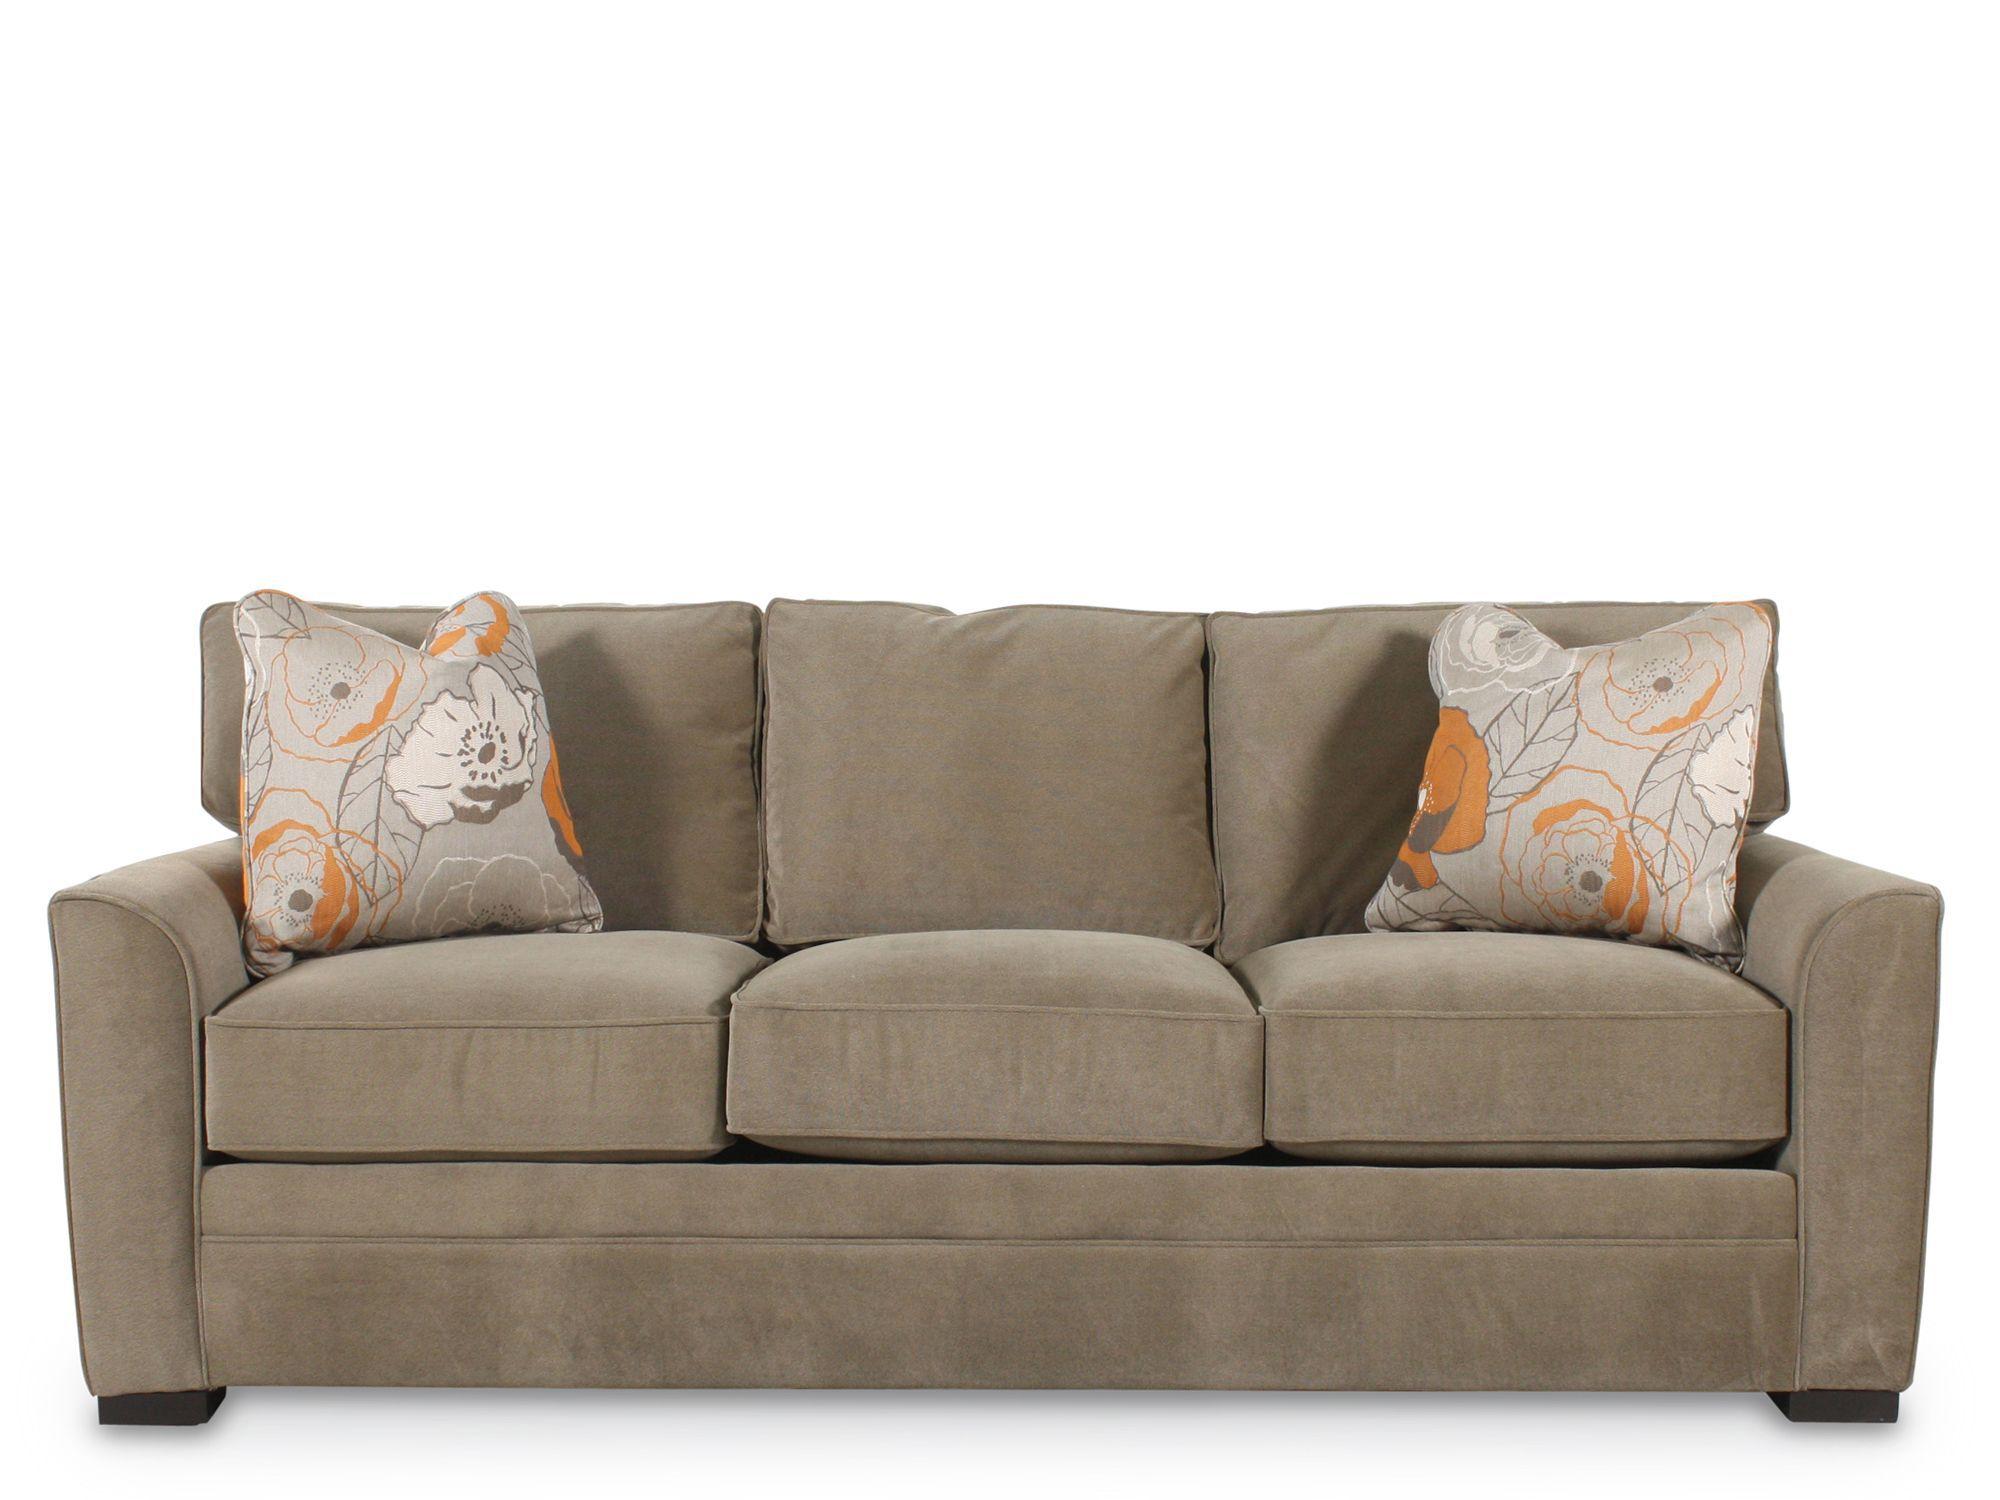 Captivating Jonathan Louis Queen Sleeper Sofa With Air Mattress ...